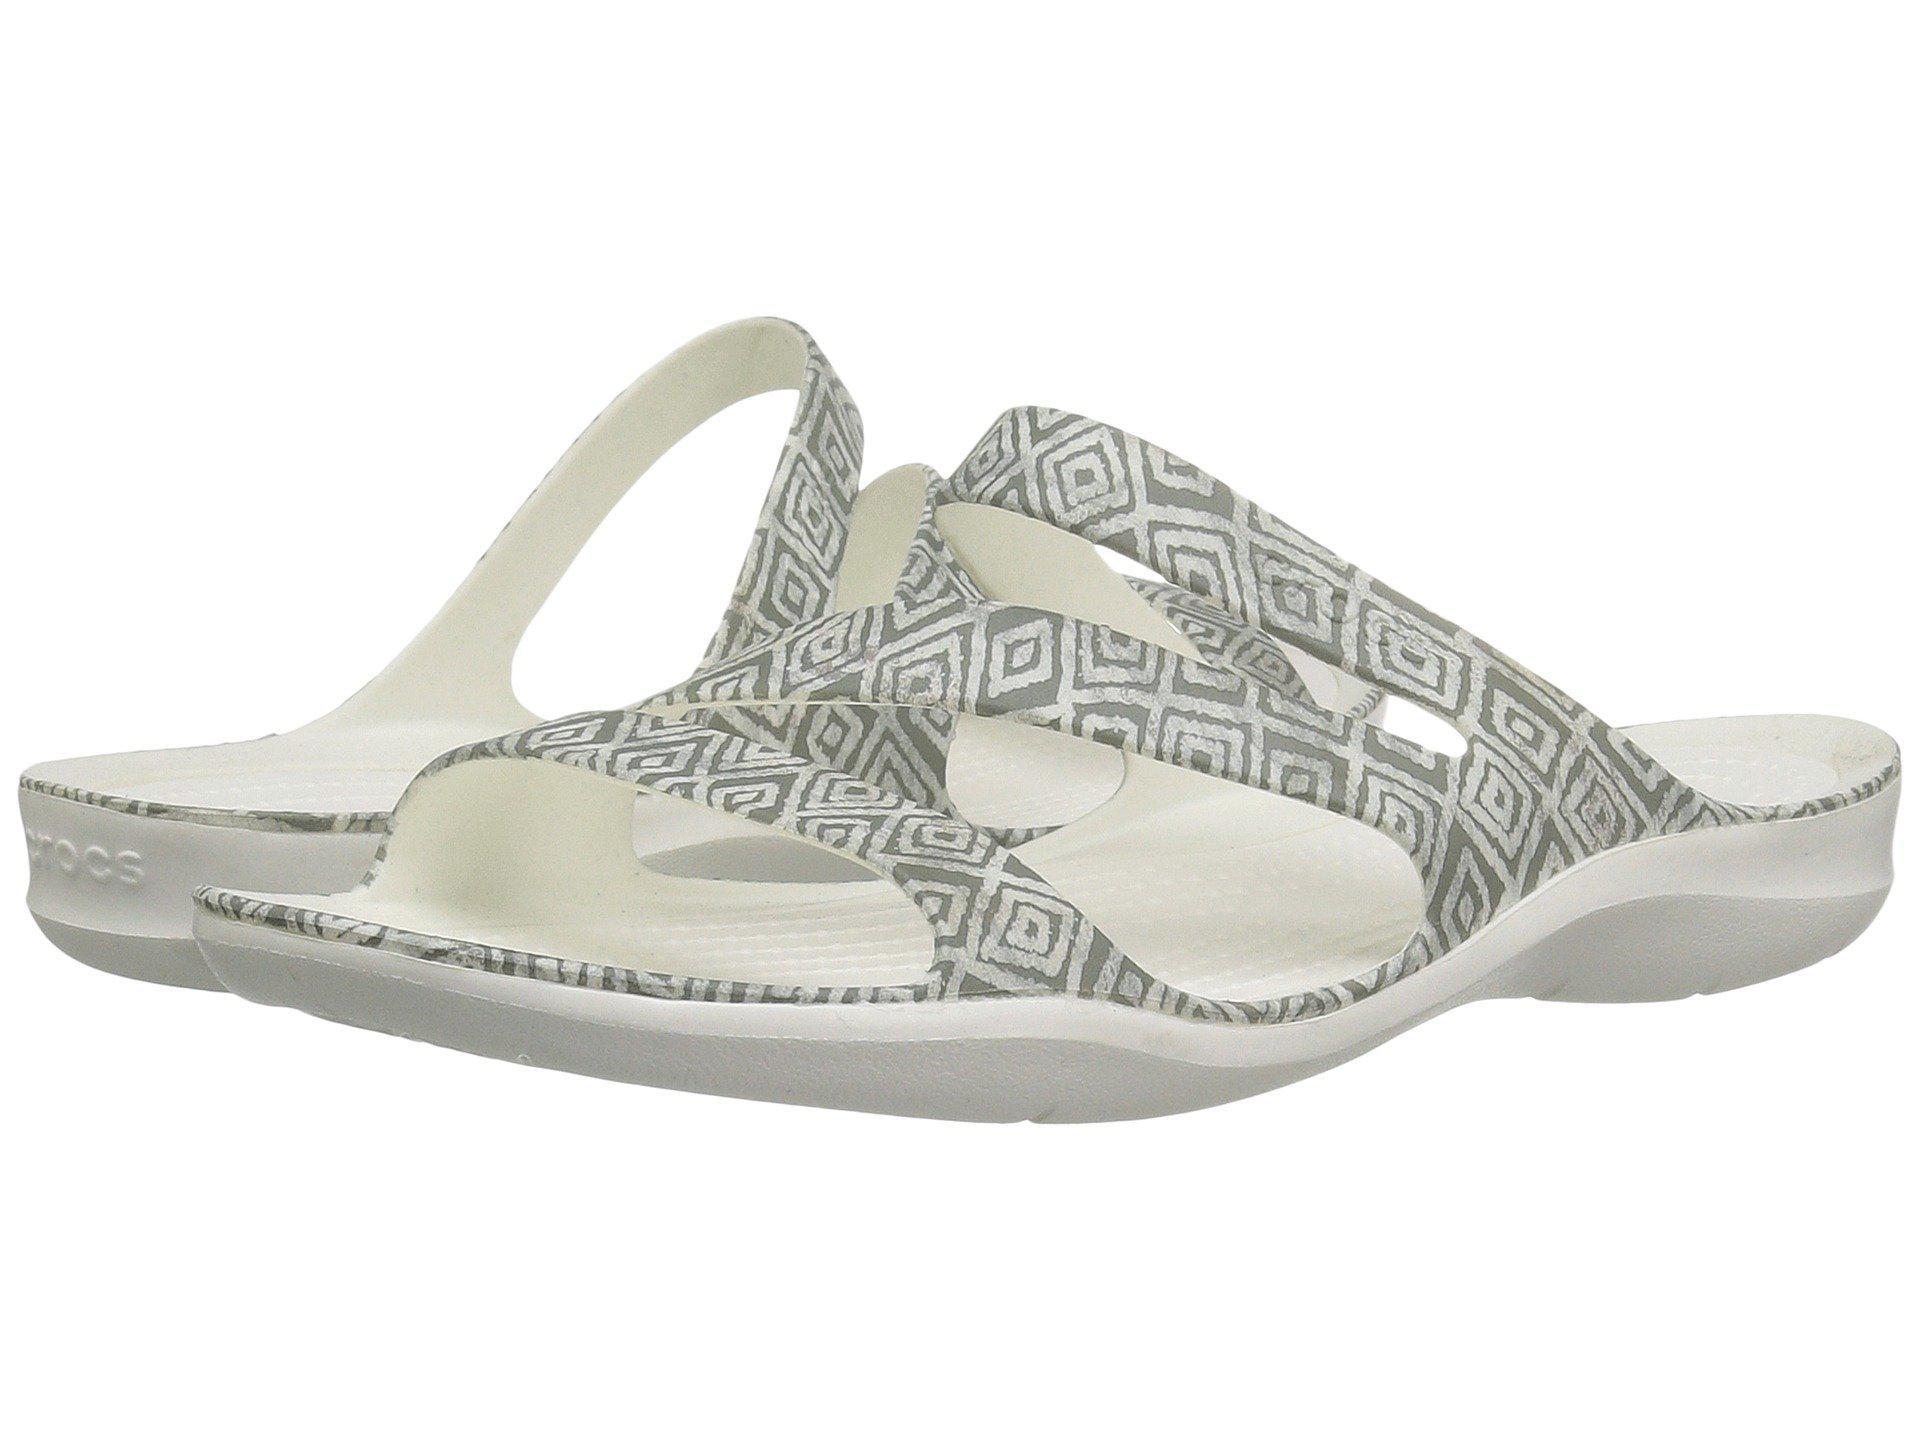 9e5d32a35d5a Lyst - Crocs™ Swiftwater Graphic Sandal (dots) Women s Sandals in Gray